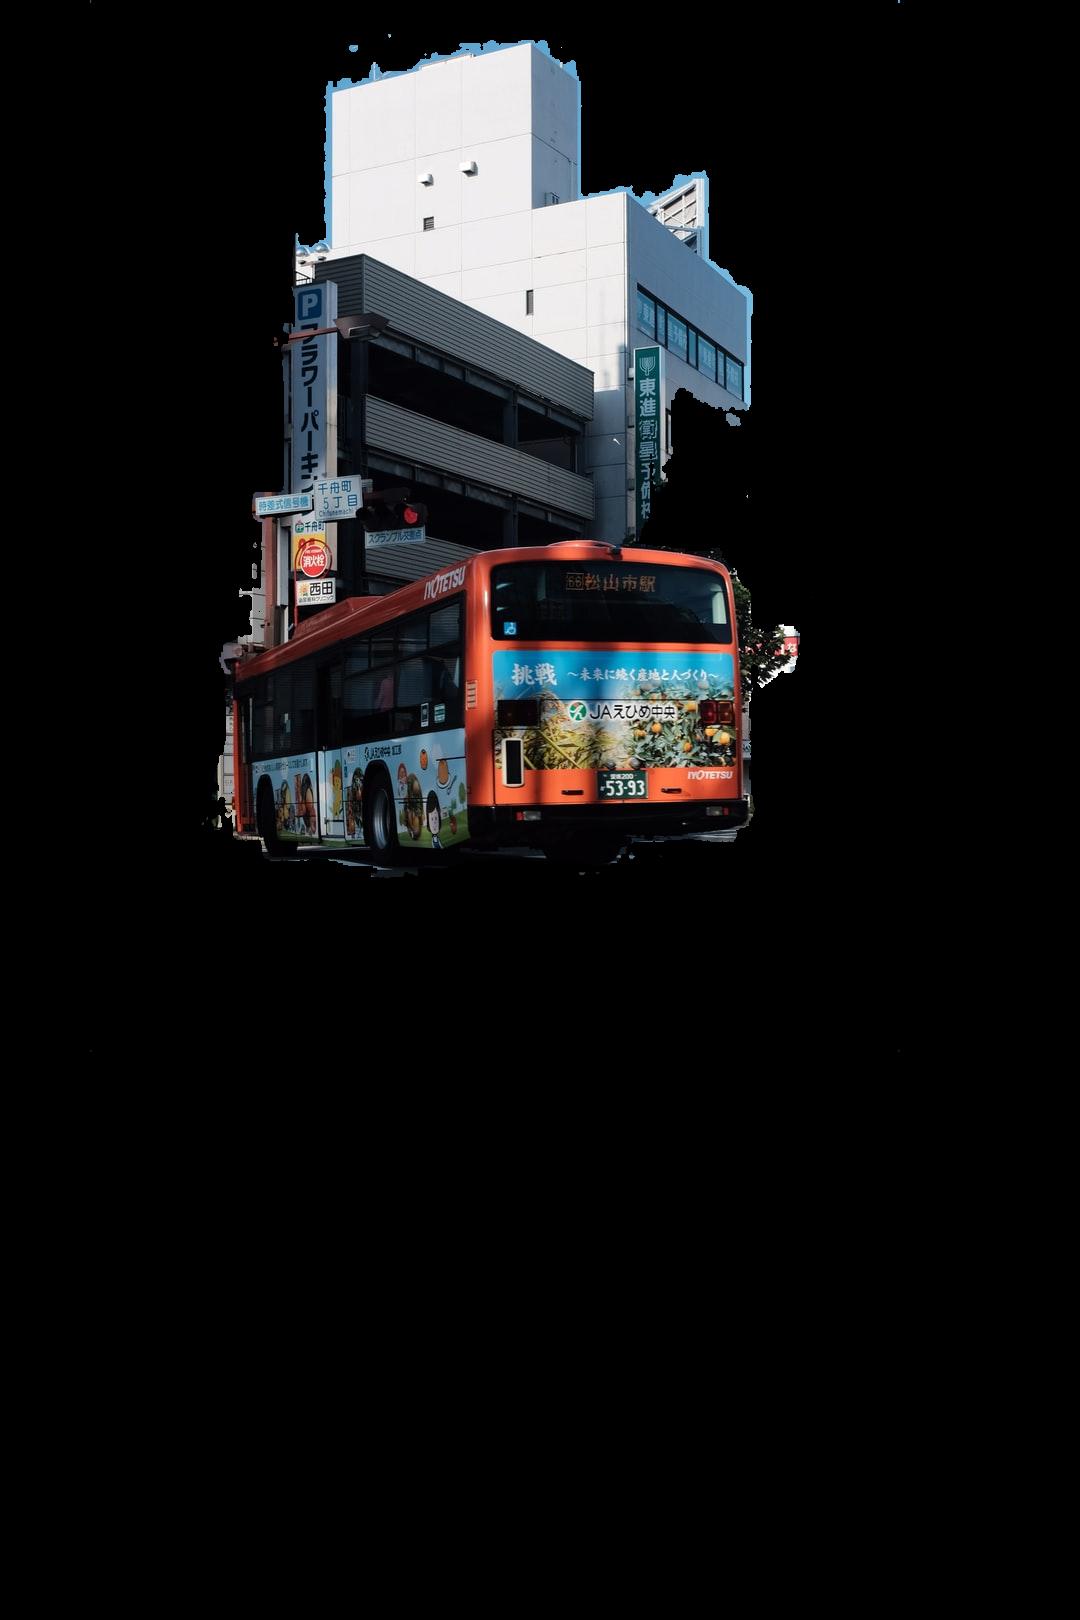 orange bus photograph